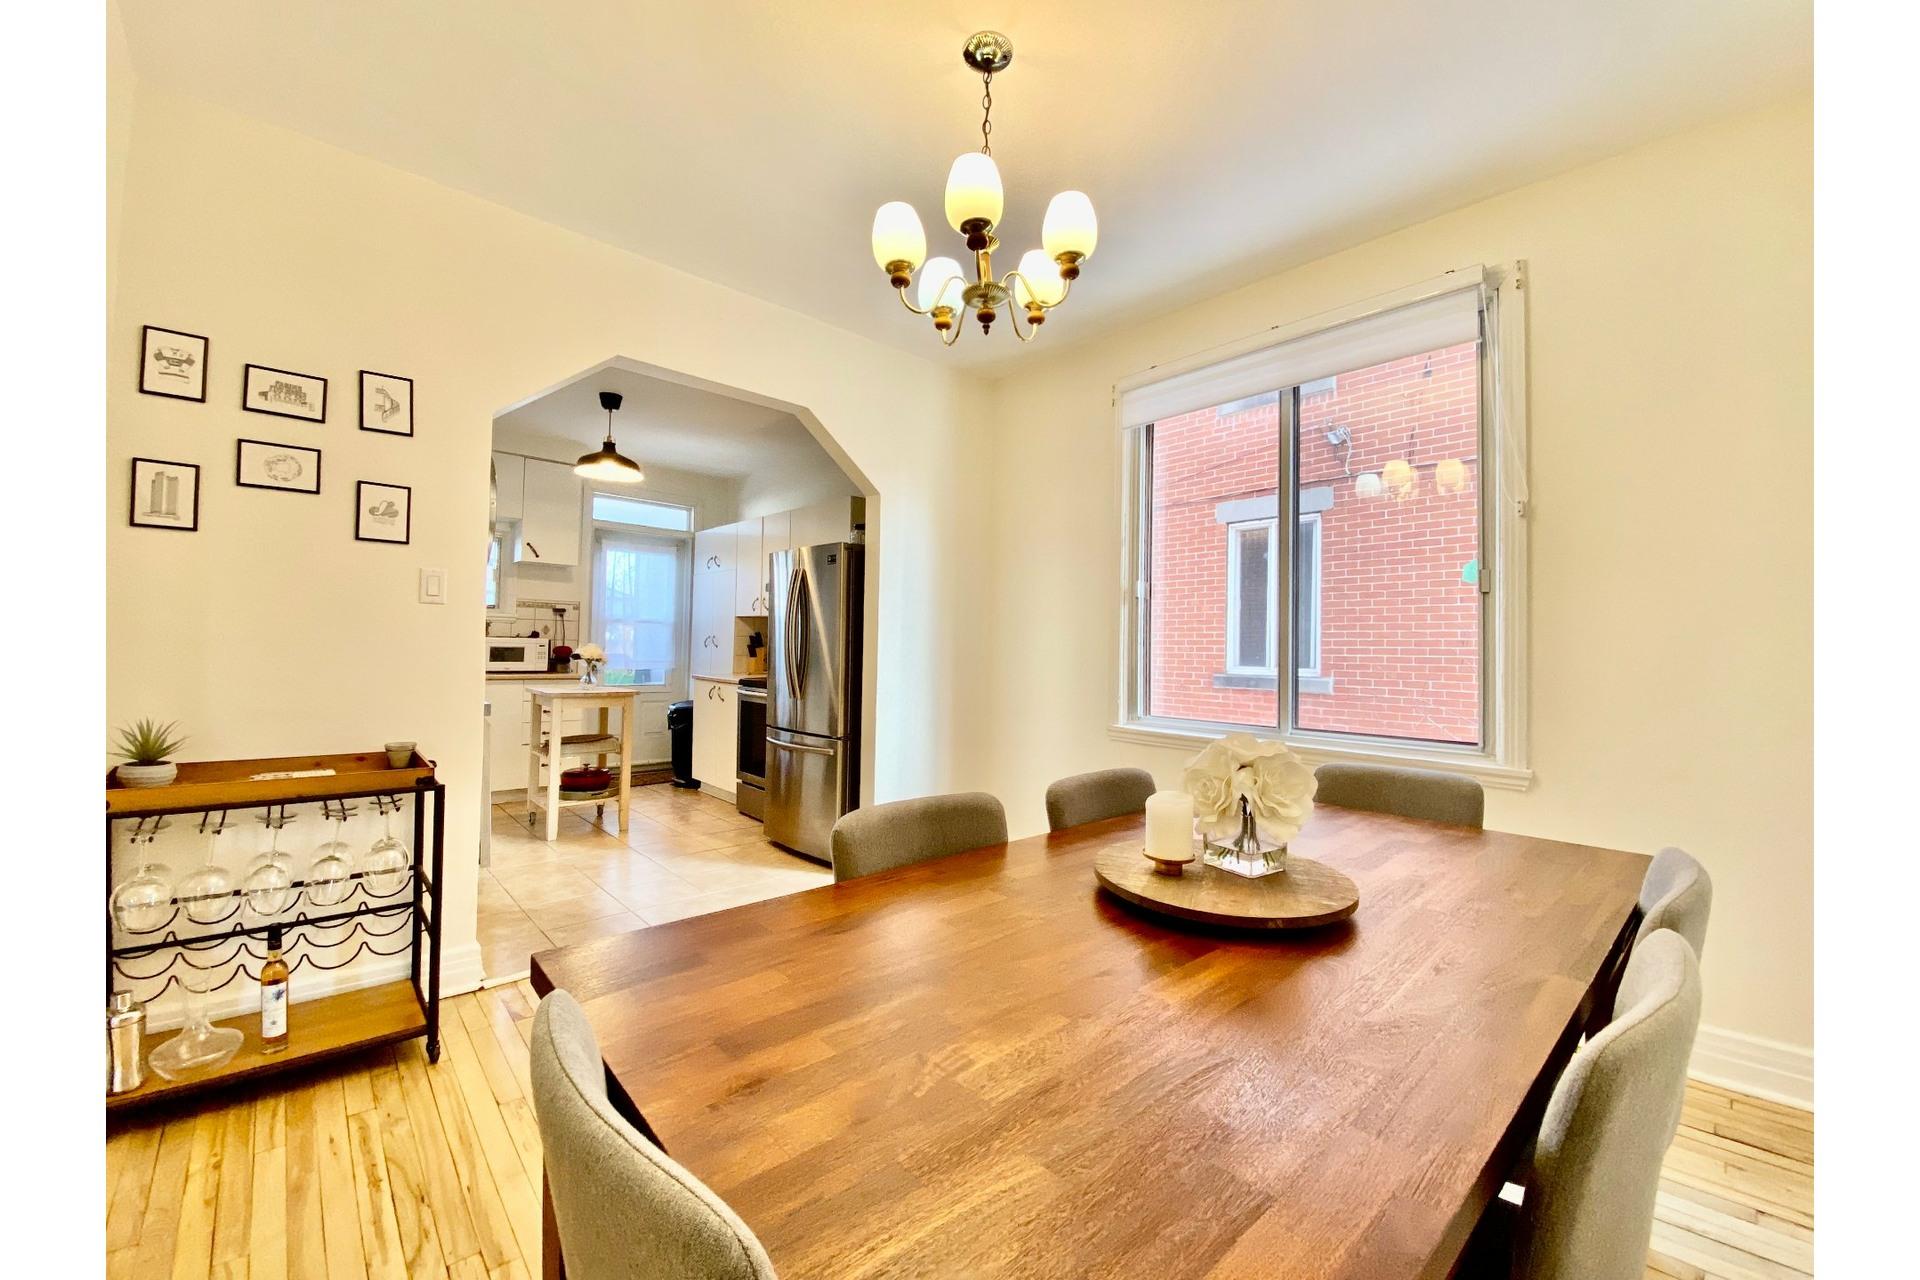 image 5 - Duplex En venta Lachine Montréal  - 6 habitaciones